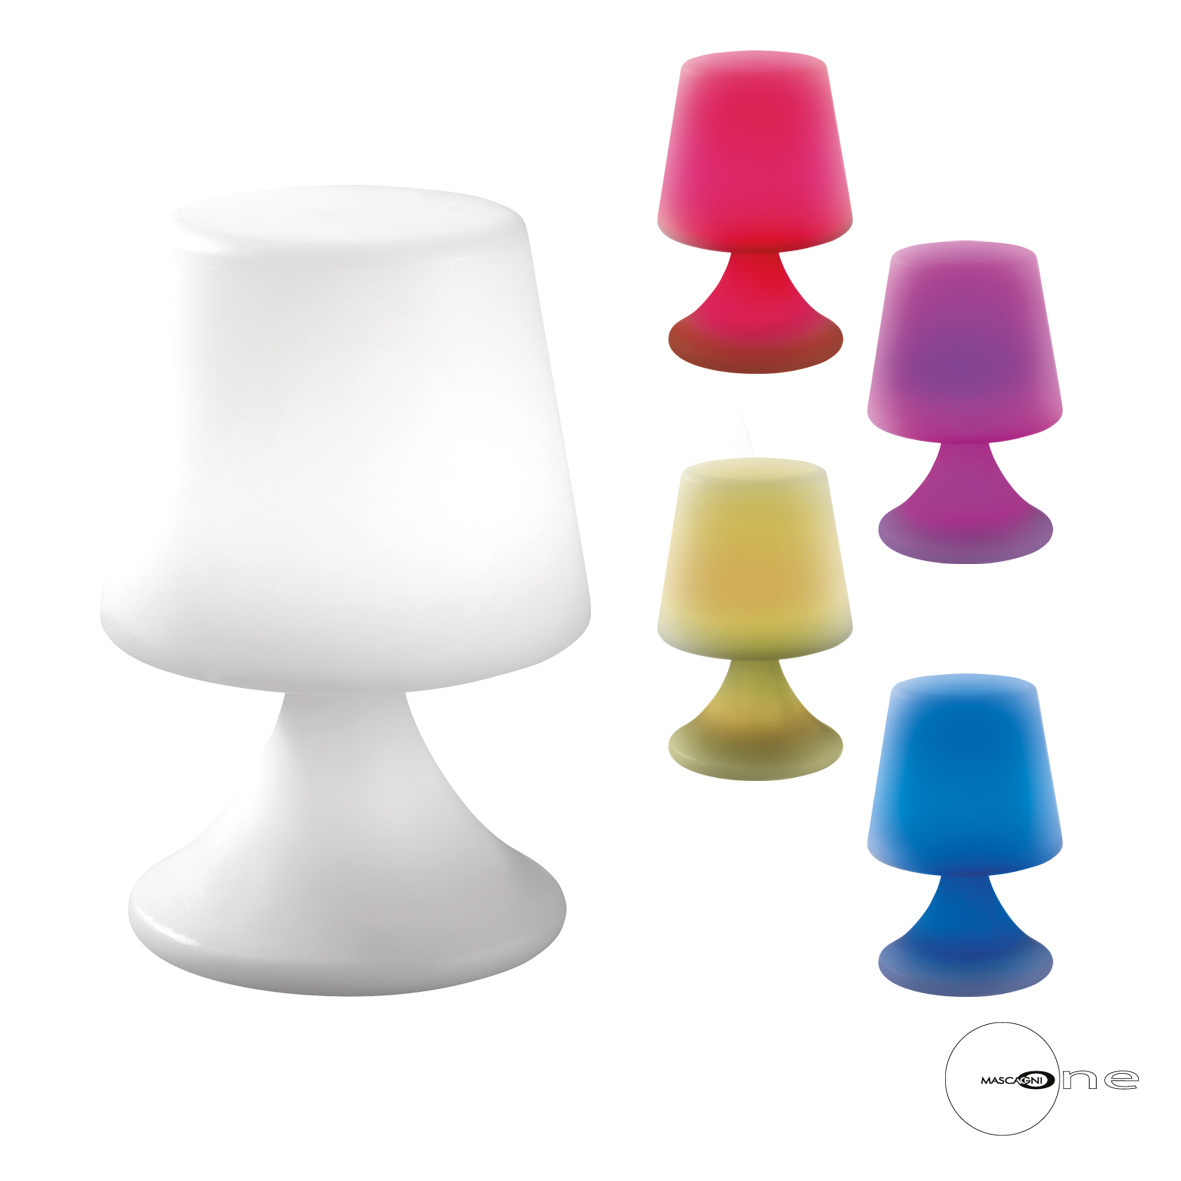 Art Mascagni O1393 RECHARGEABLE LED LAMP